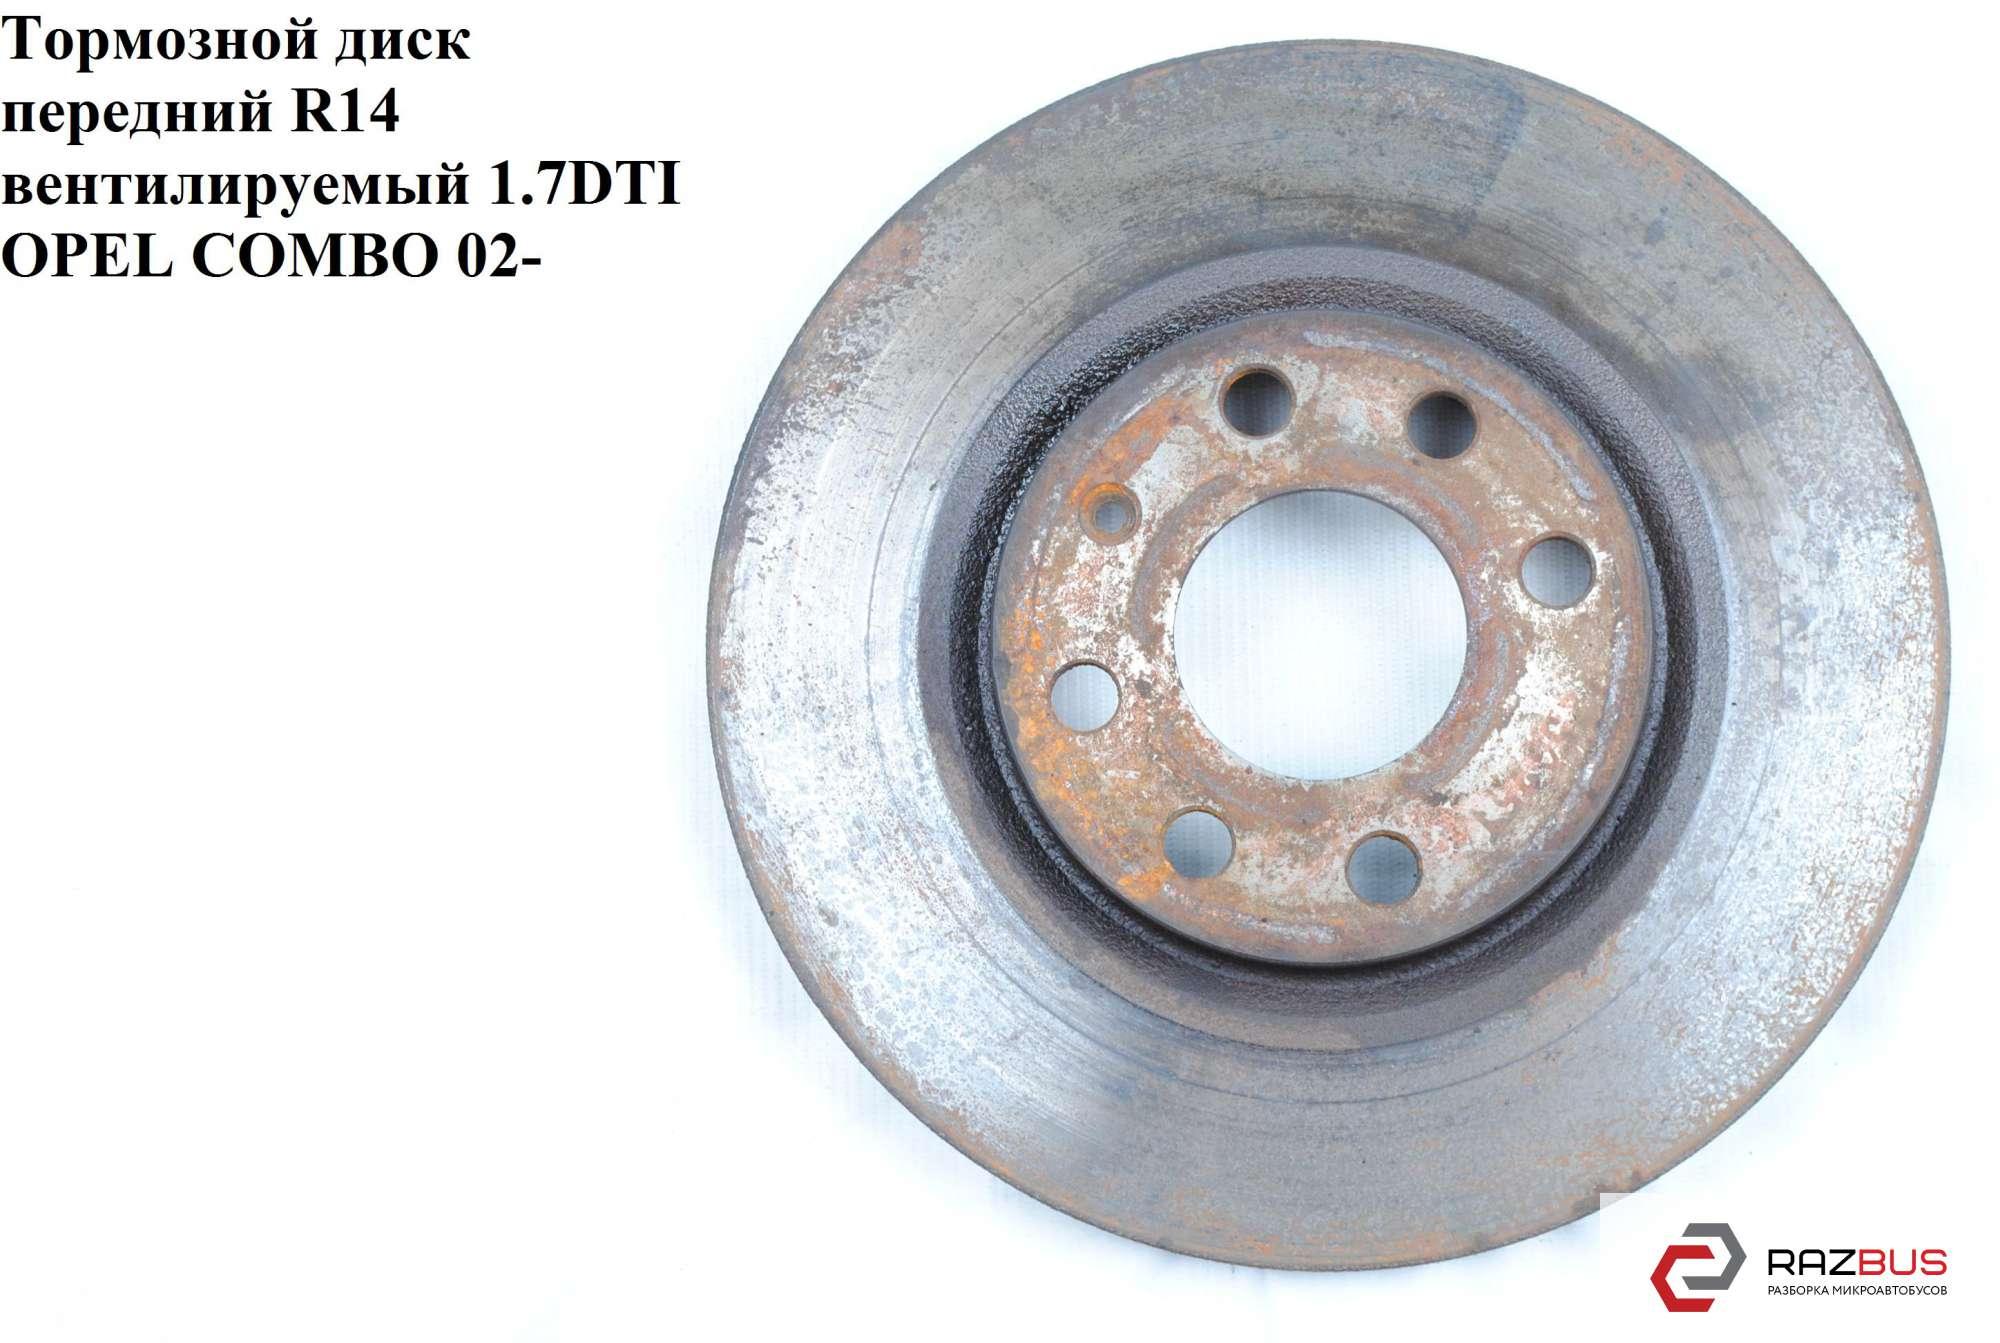 9196050 Тормозной диск передний D260 4 болта OPEL COMBO 2001-2011г